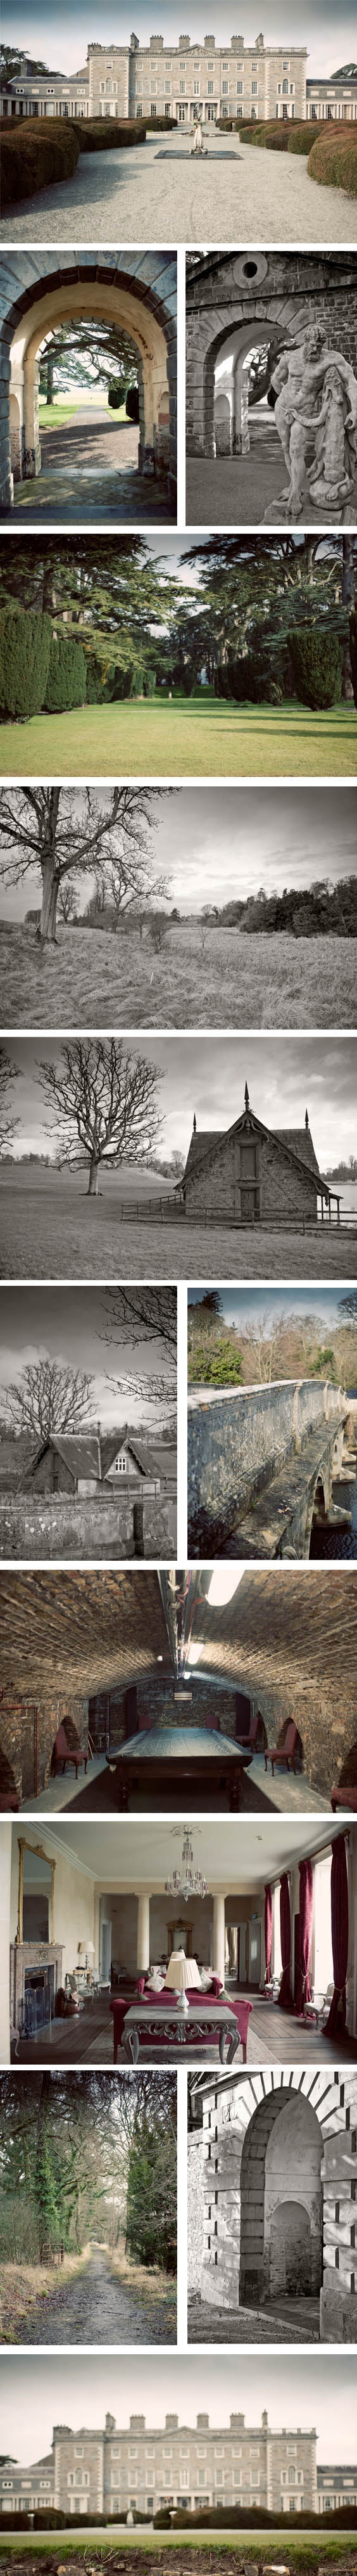 Carton House Hotel wedding locations by studio33weddingscom